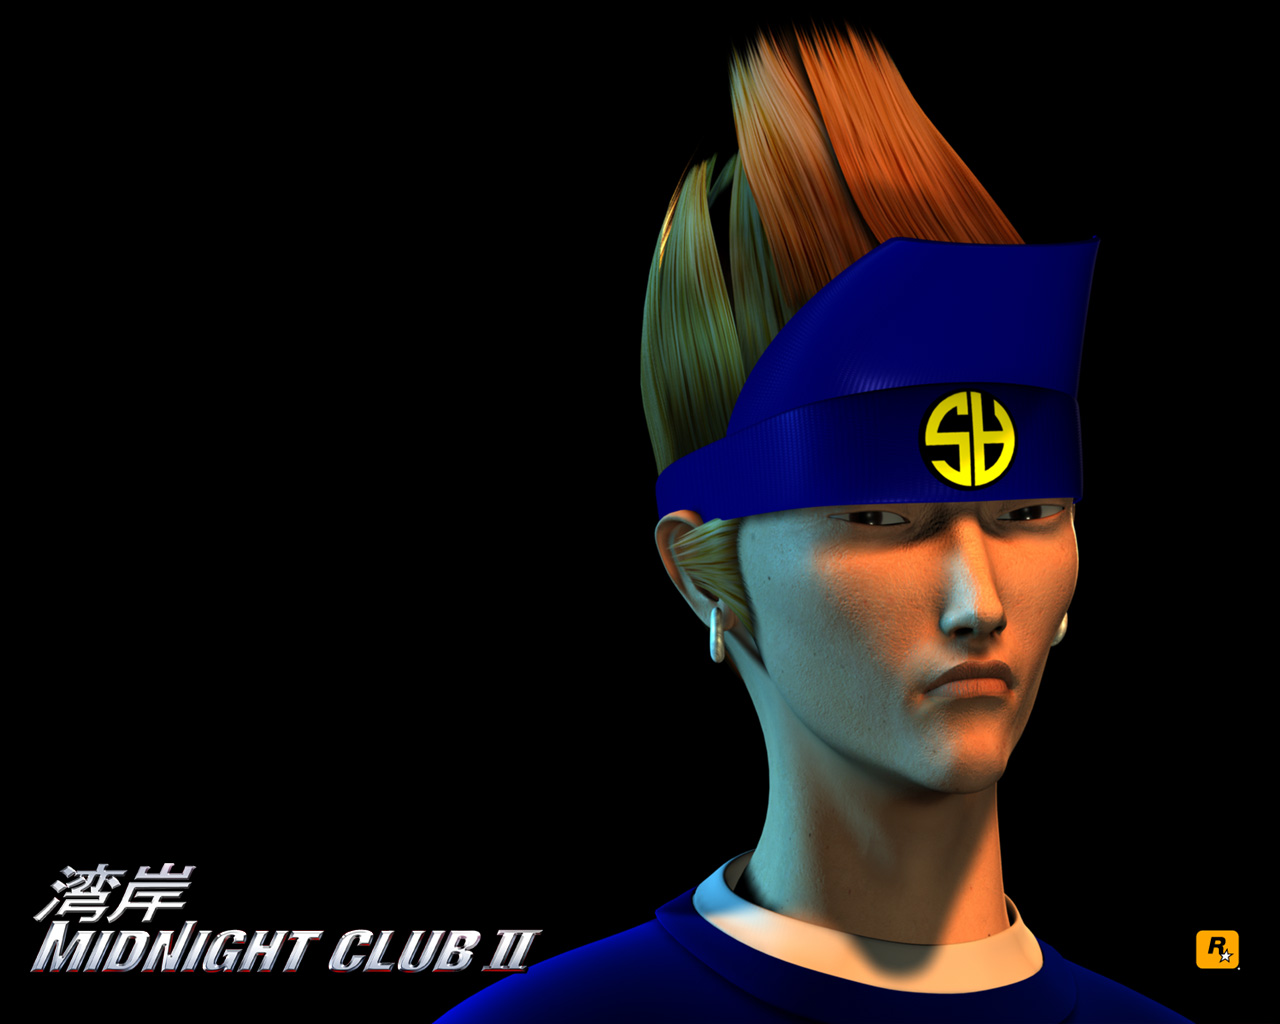 nikko midnight club wiki